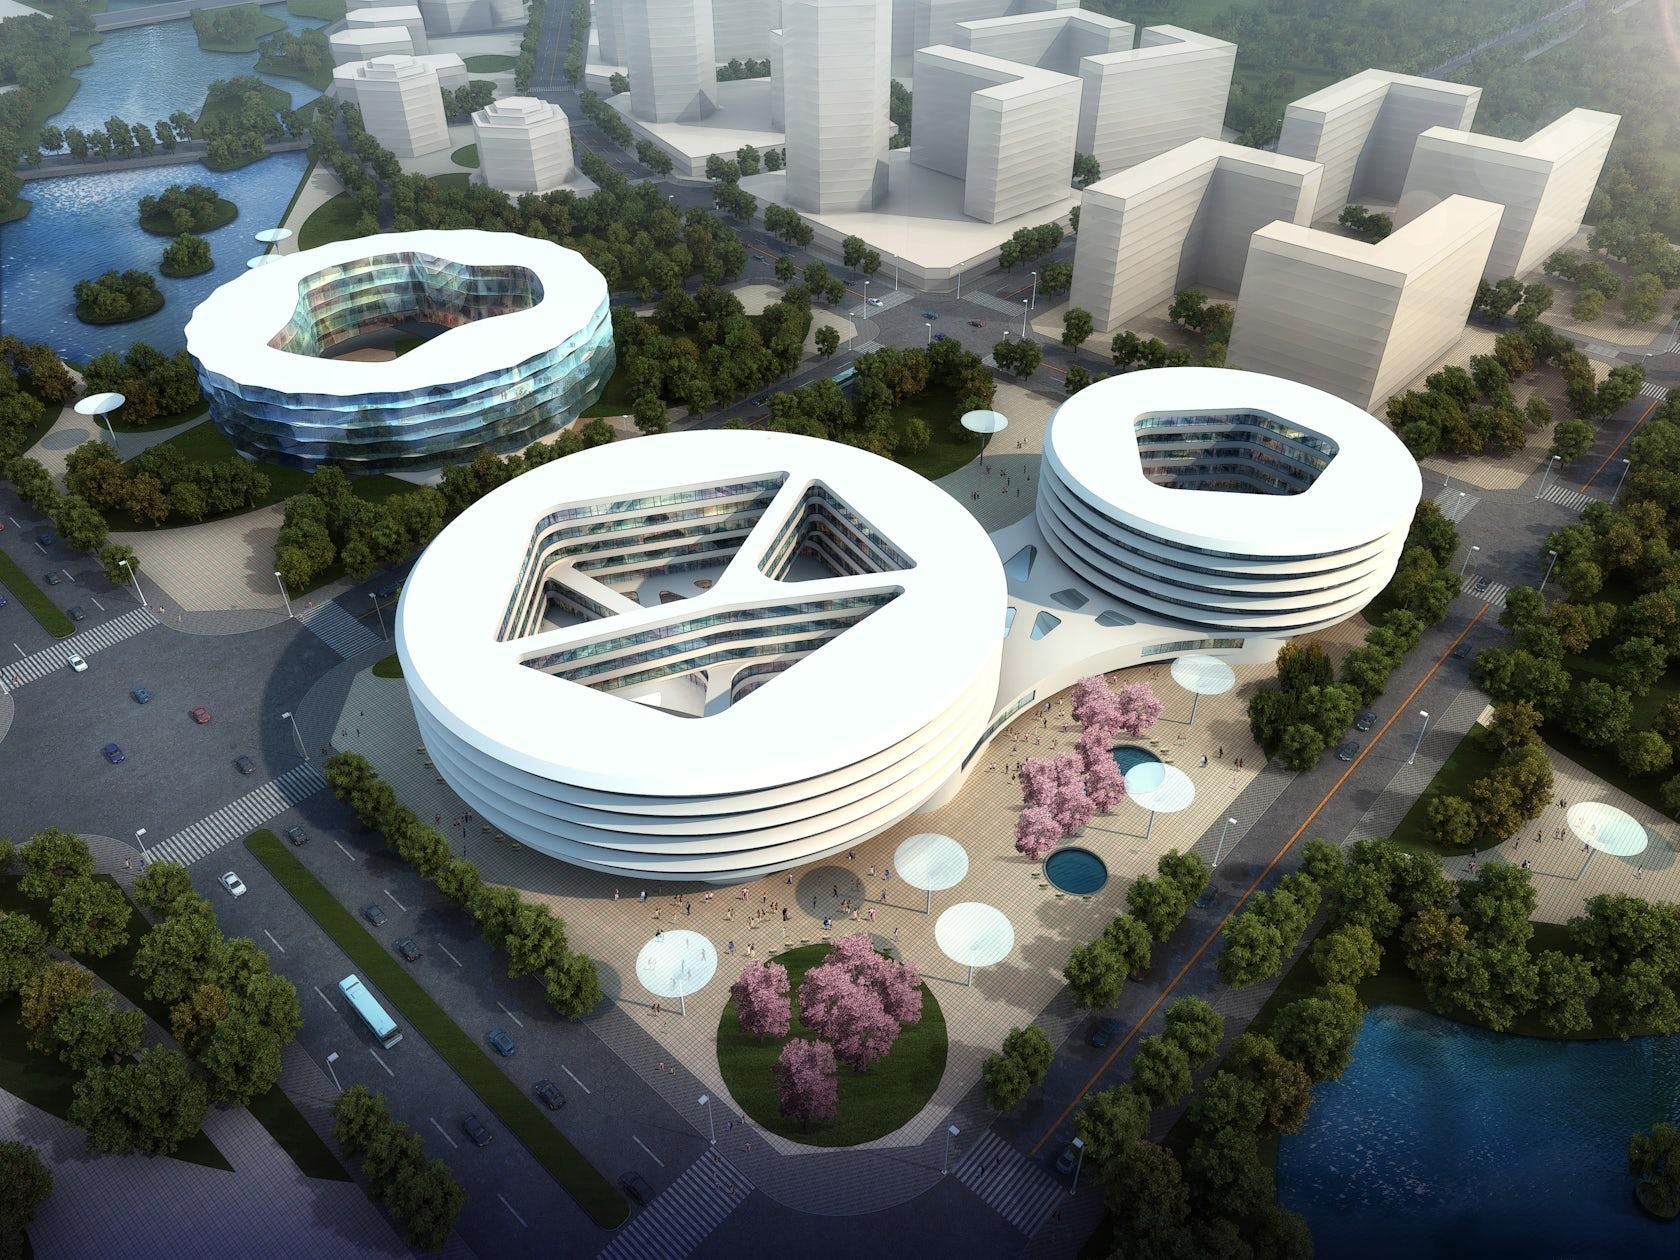 Civic center hangzhou architizer - Hangzhou congress center ...